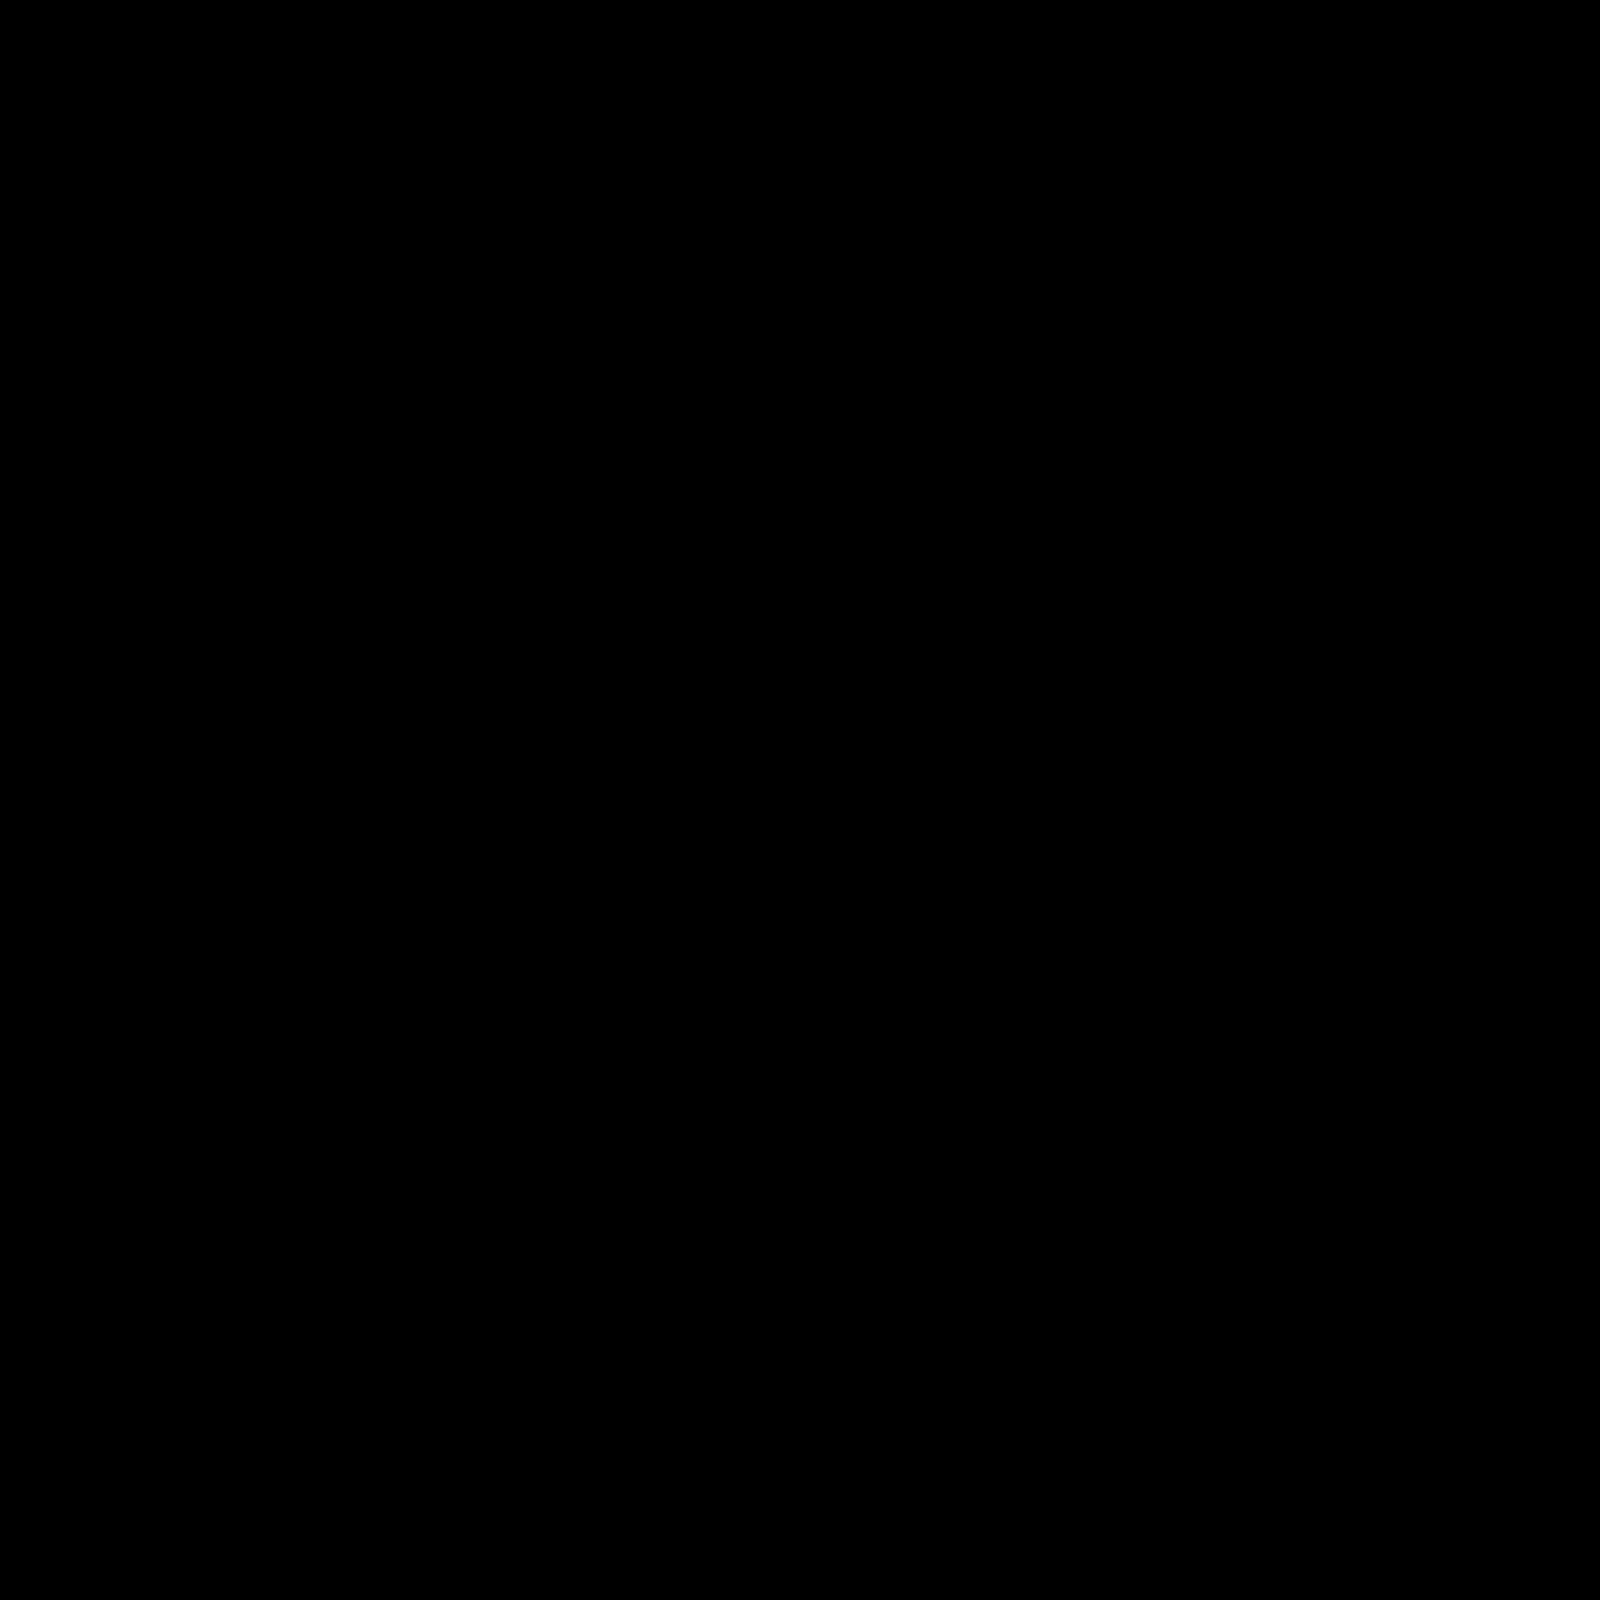 Lavoro icon